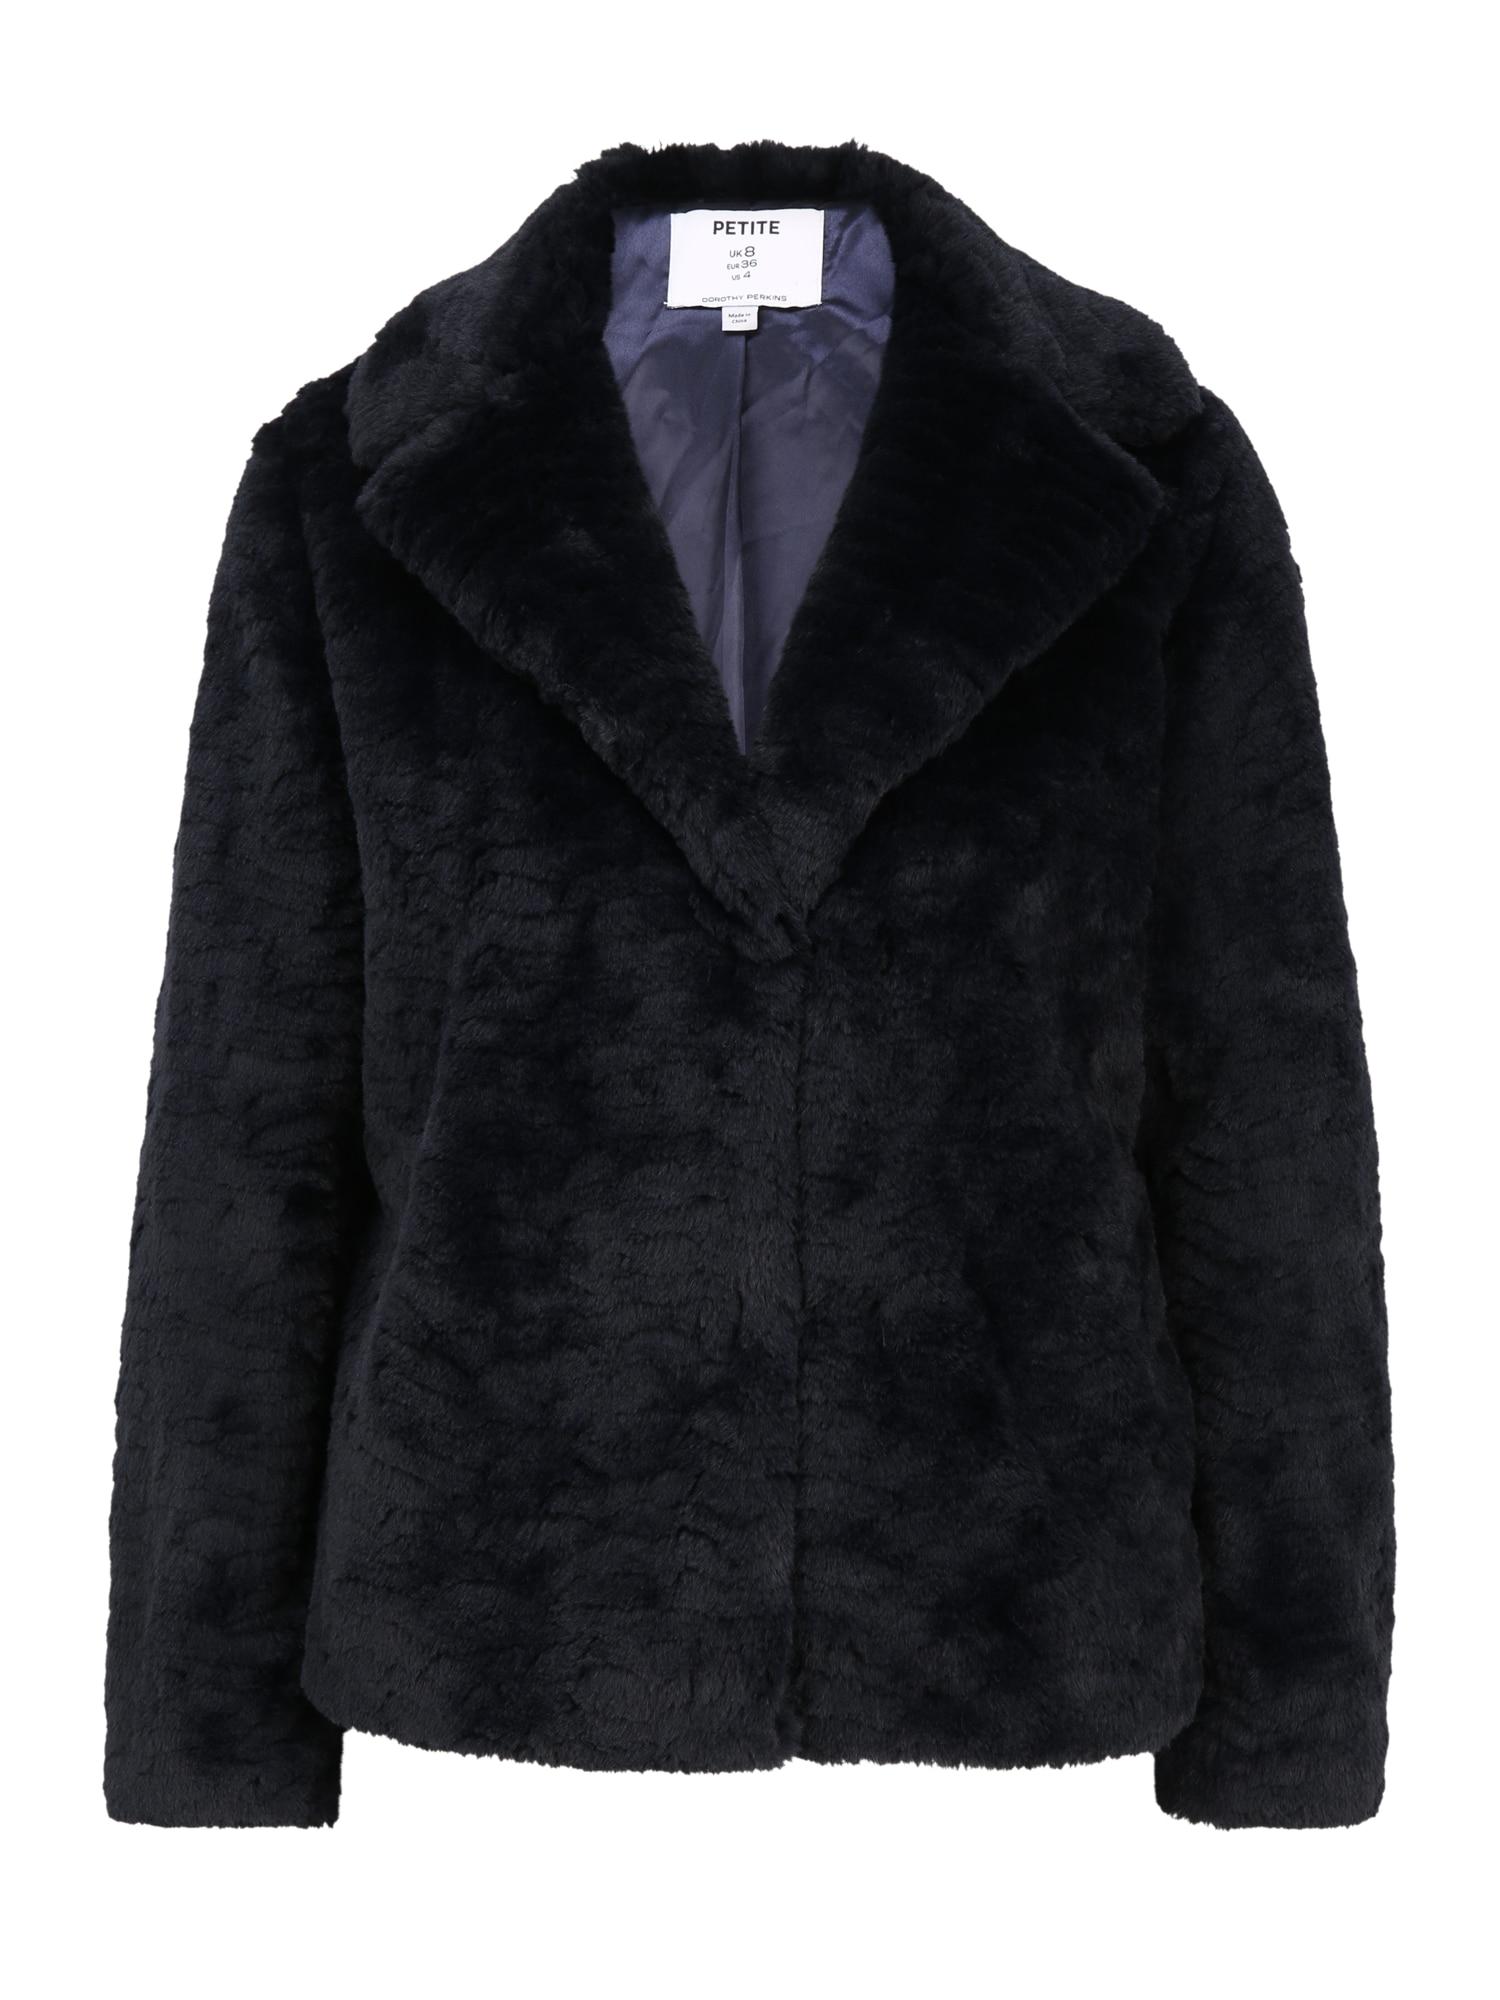 Dorothy Perkins (Petite) Demisezoninis paltas kobalto mėlyna